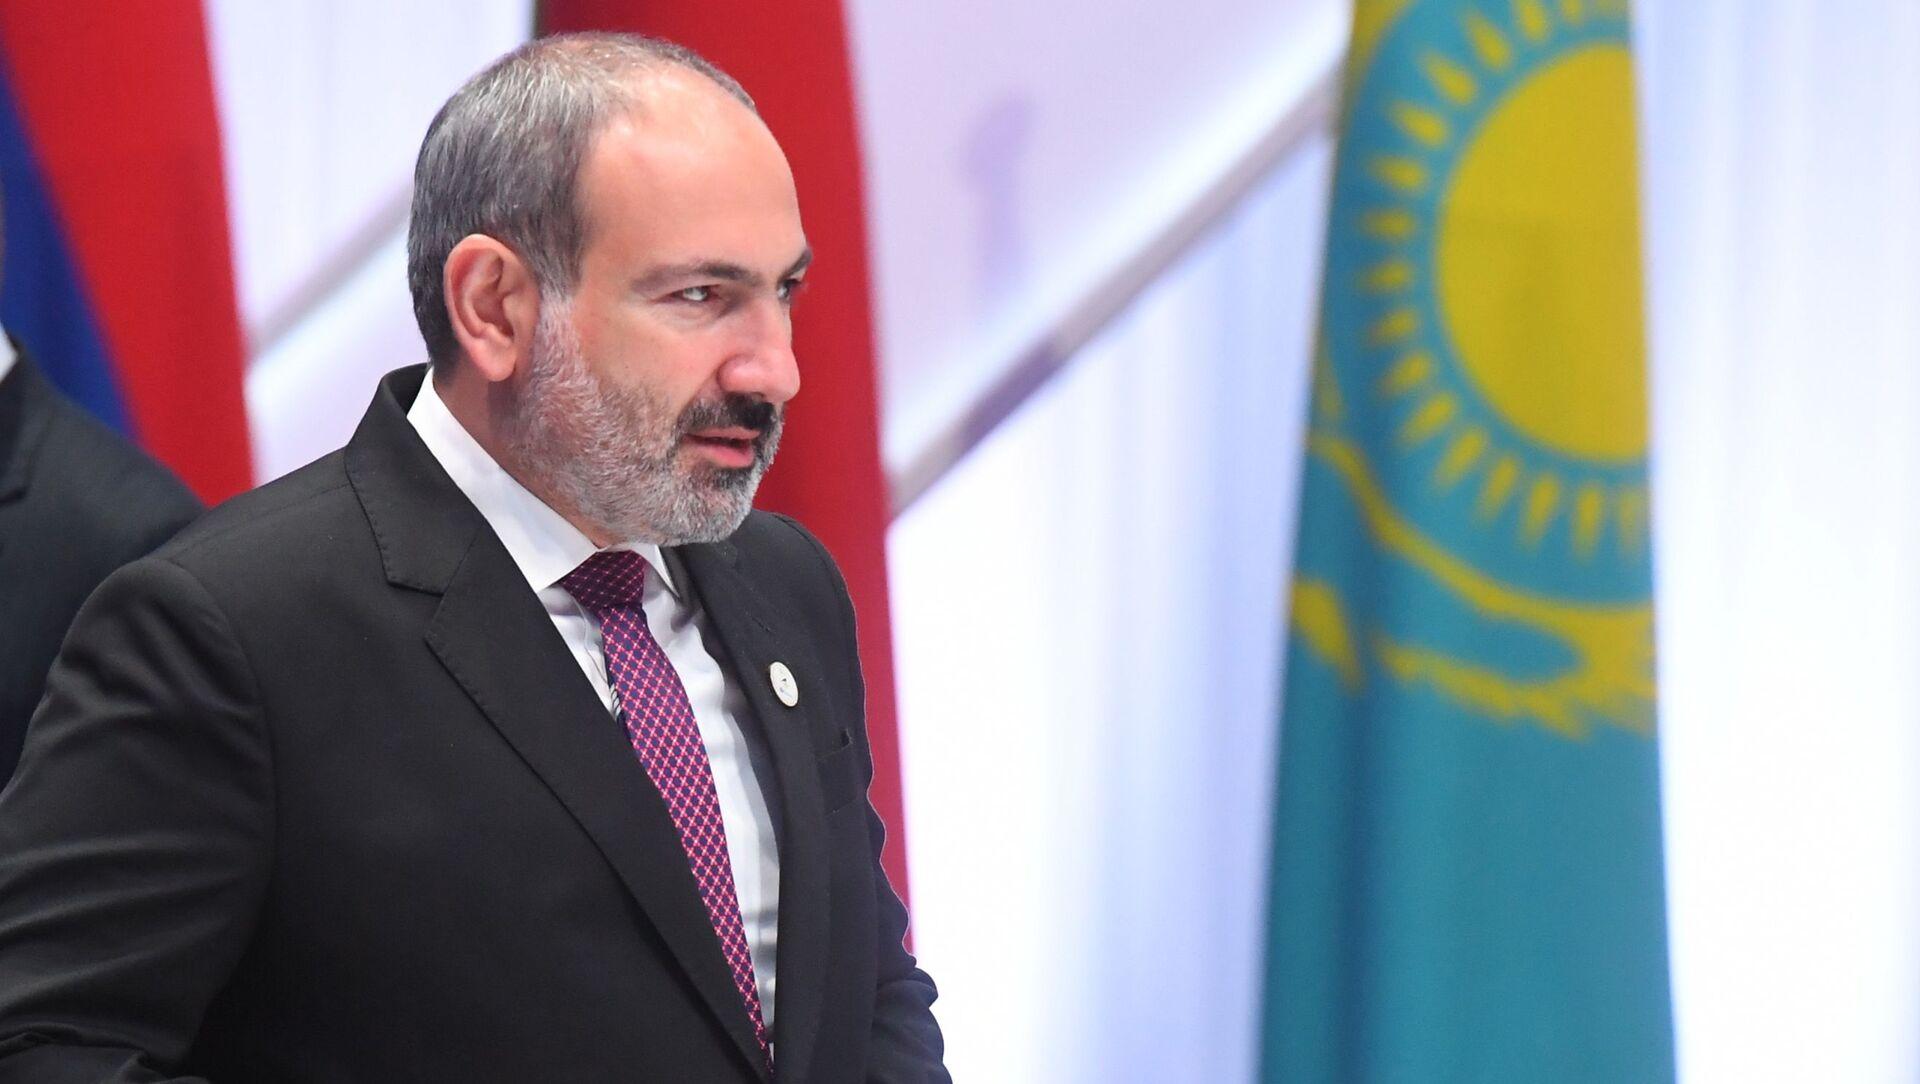 Премьер-министр Армении Никол Пашинян, фото из архива - Sputnik Azərbaycan, 1920, 16.09.2021